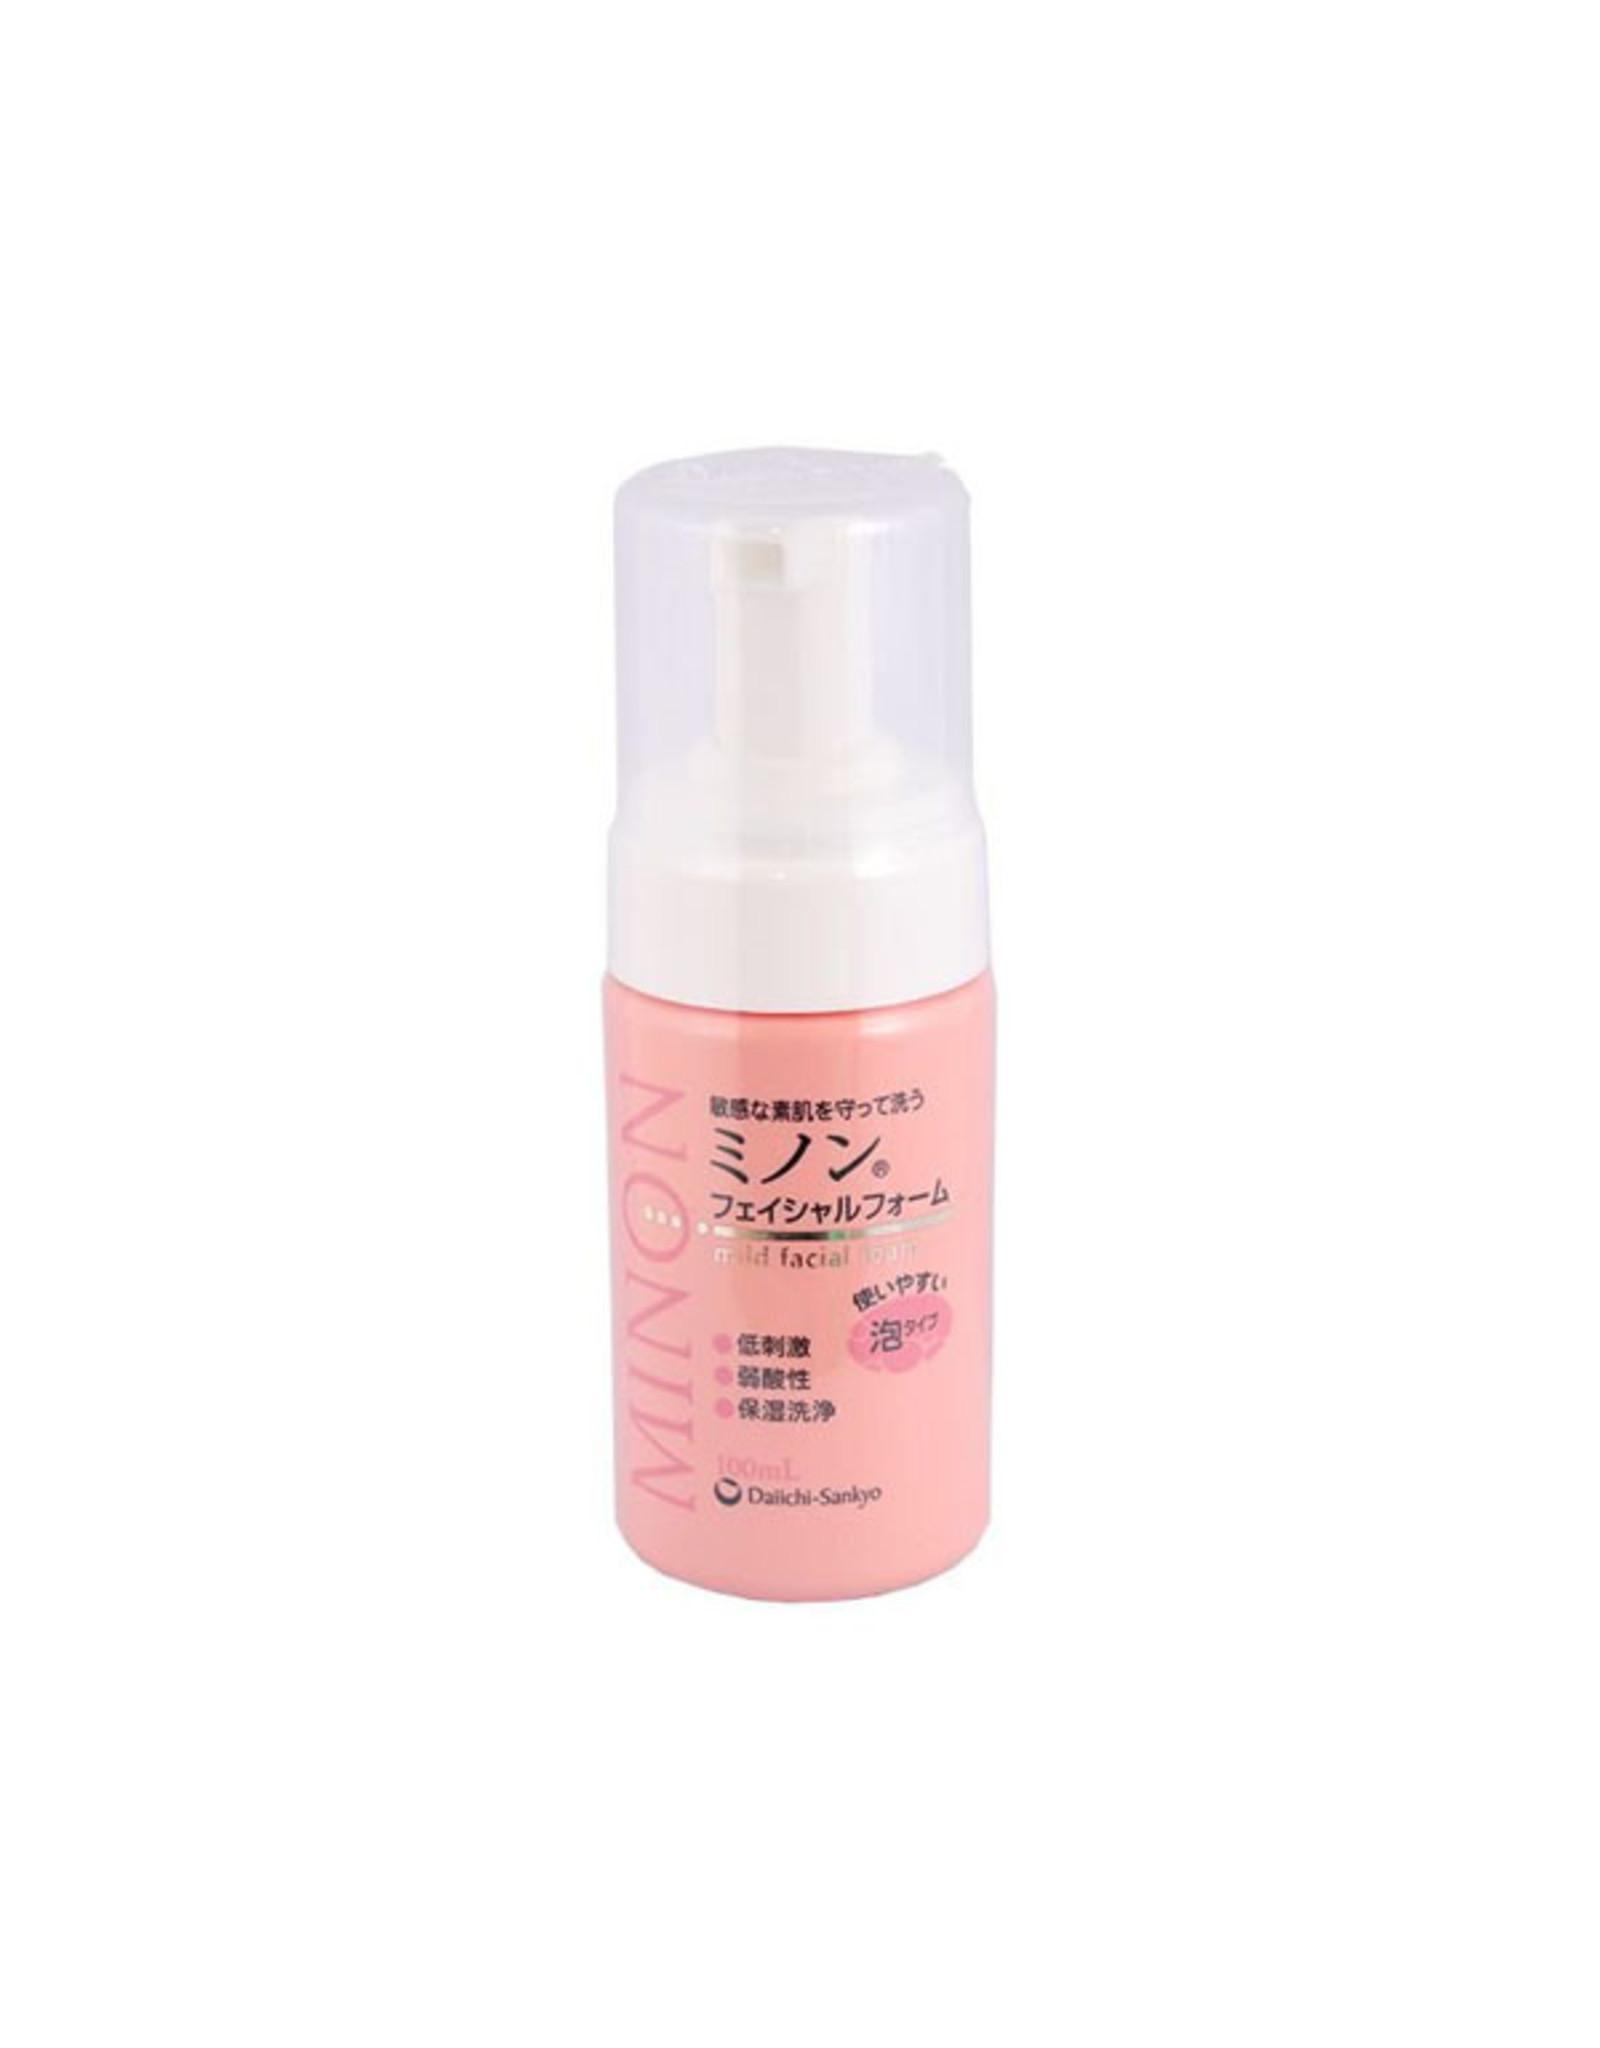 Minon Daiichi Sankyo Minon Mild Facial Washing Foam 100g